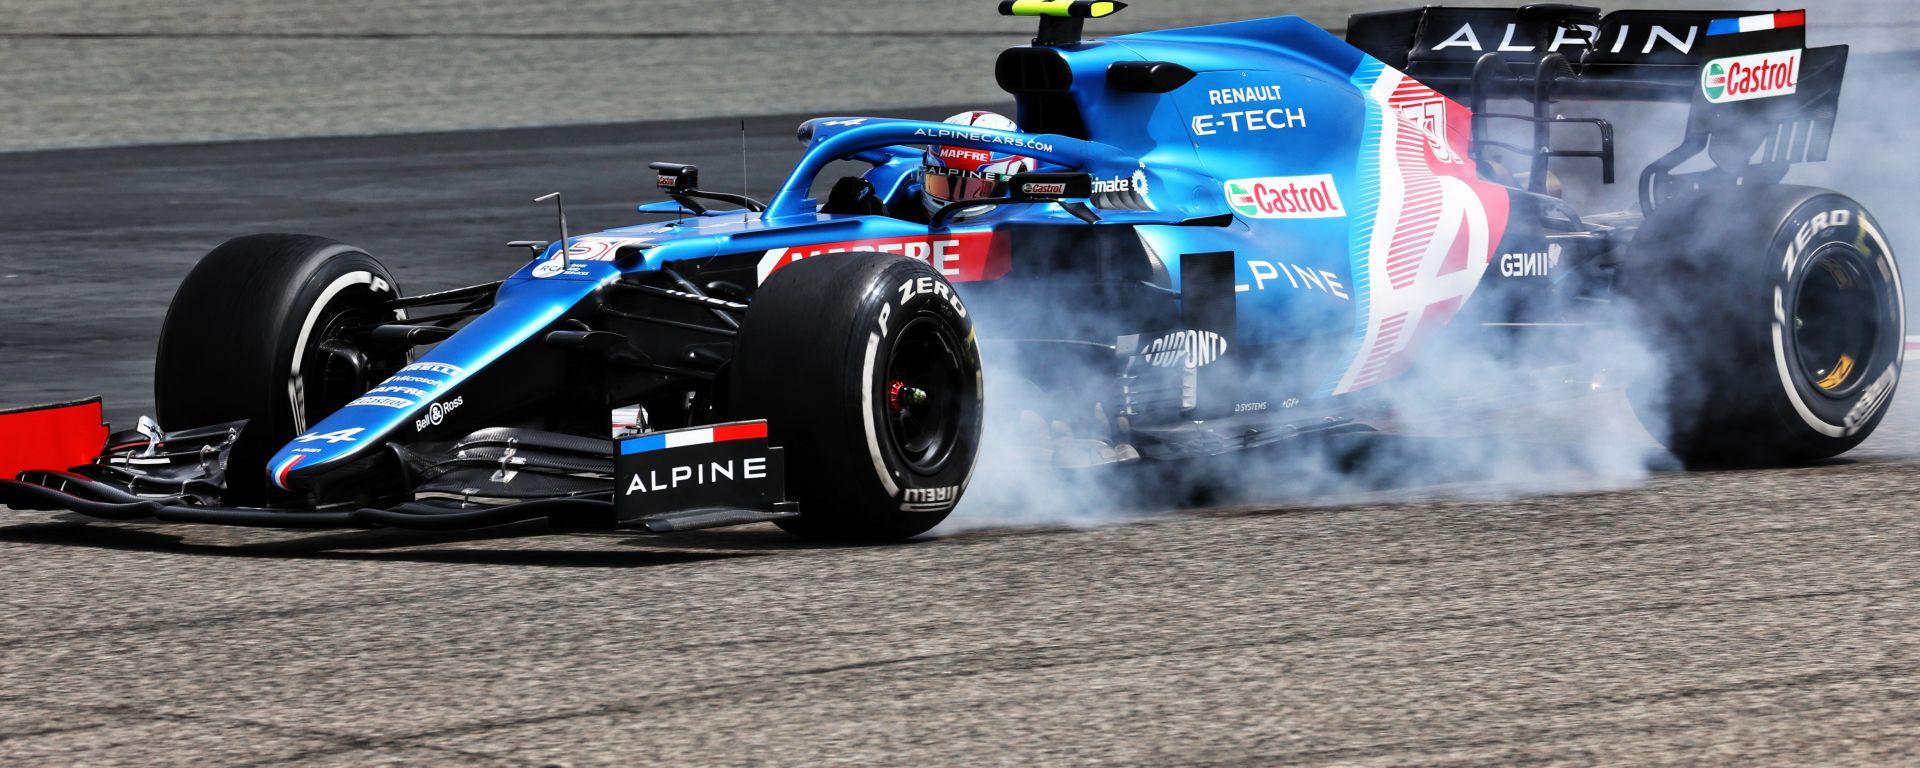 F1 Test Bahrain 2021, Sakhir: Esteban Ocon (Alpine-Renault)